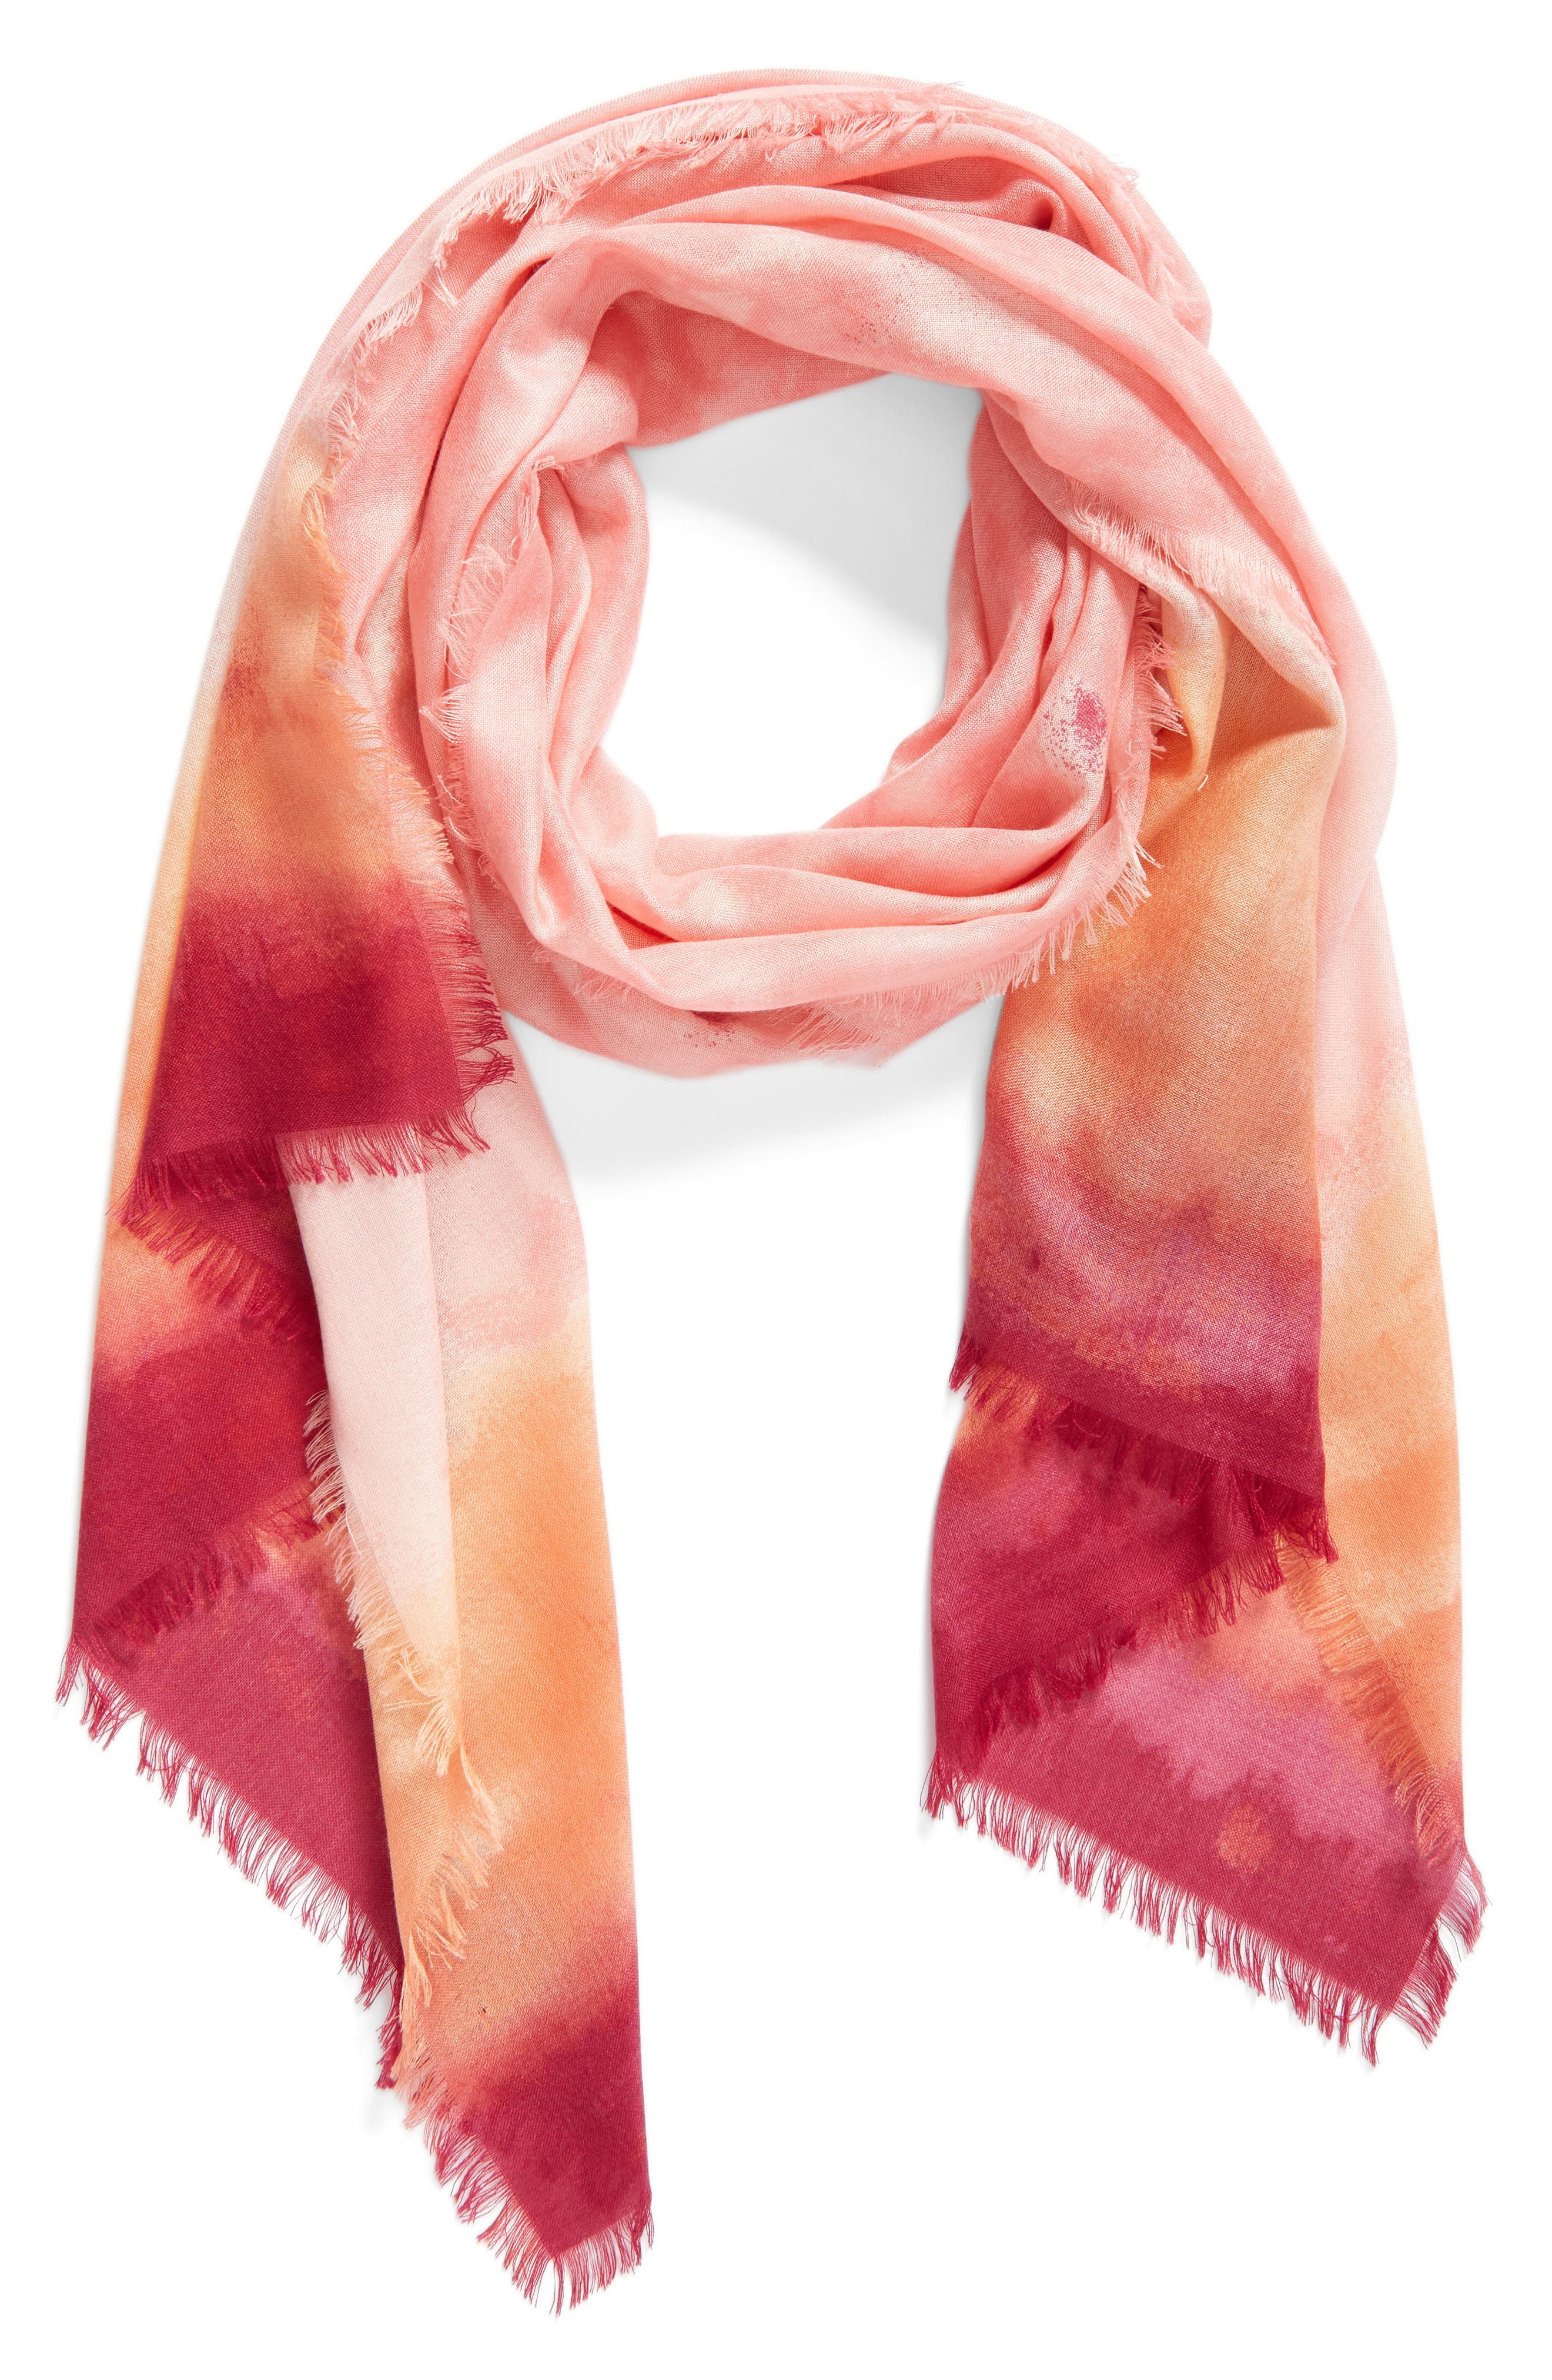 Alternate Image 1 Selected - Nordstrom Saharan Colorwash Cashmere & Silk Scarf